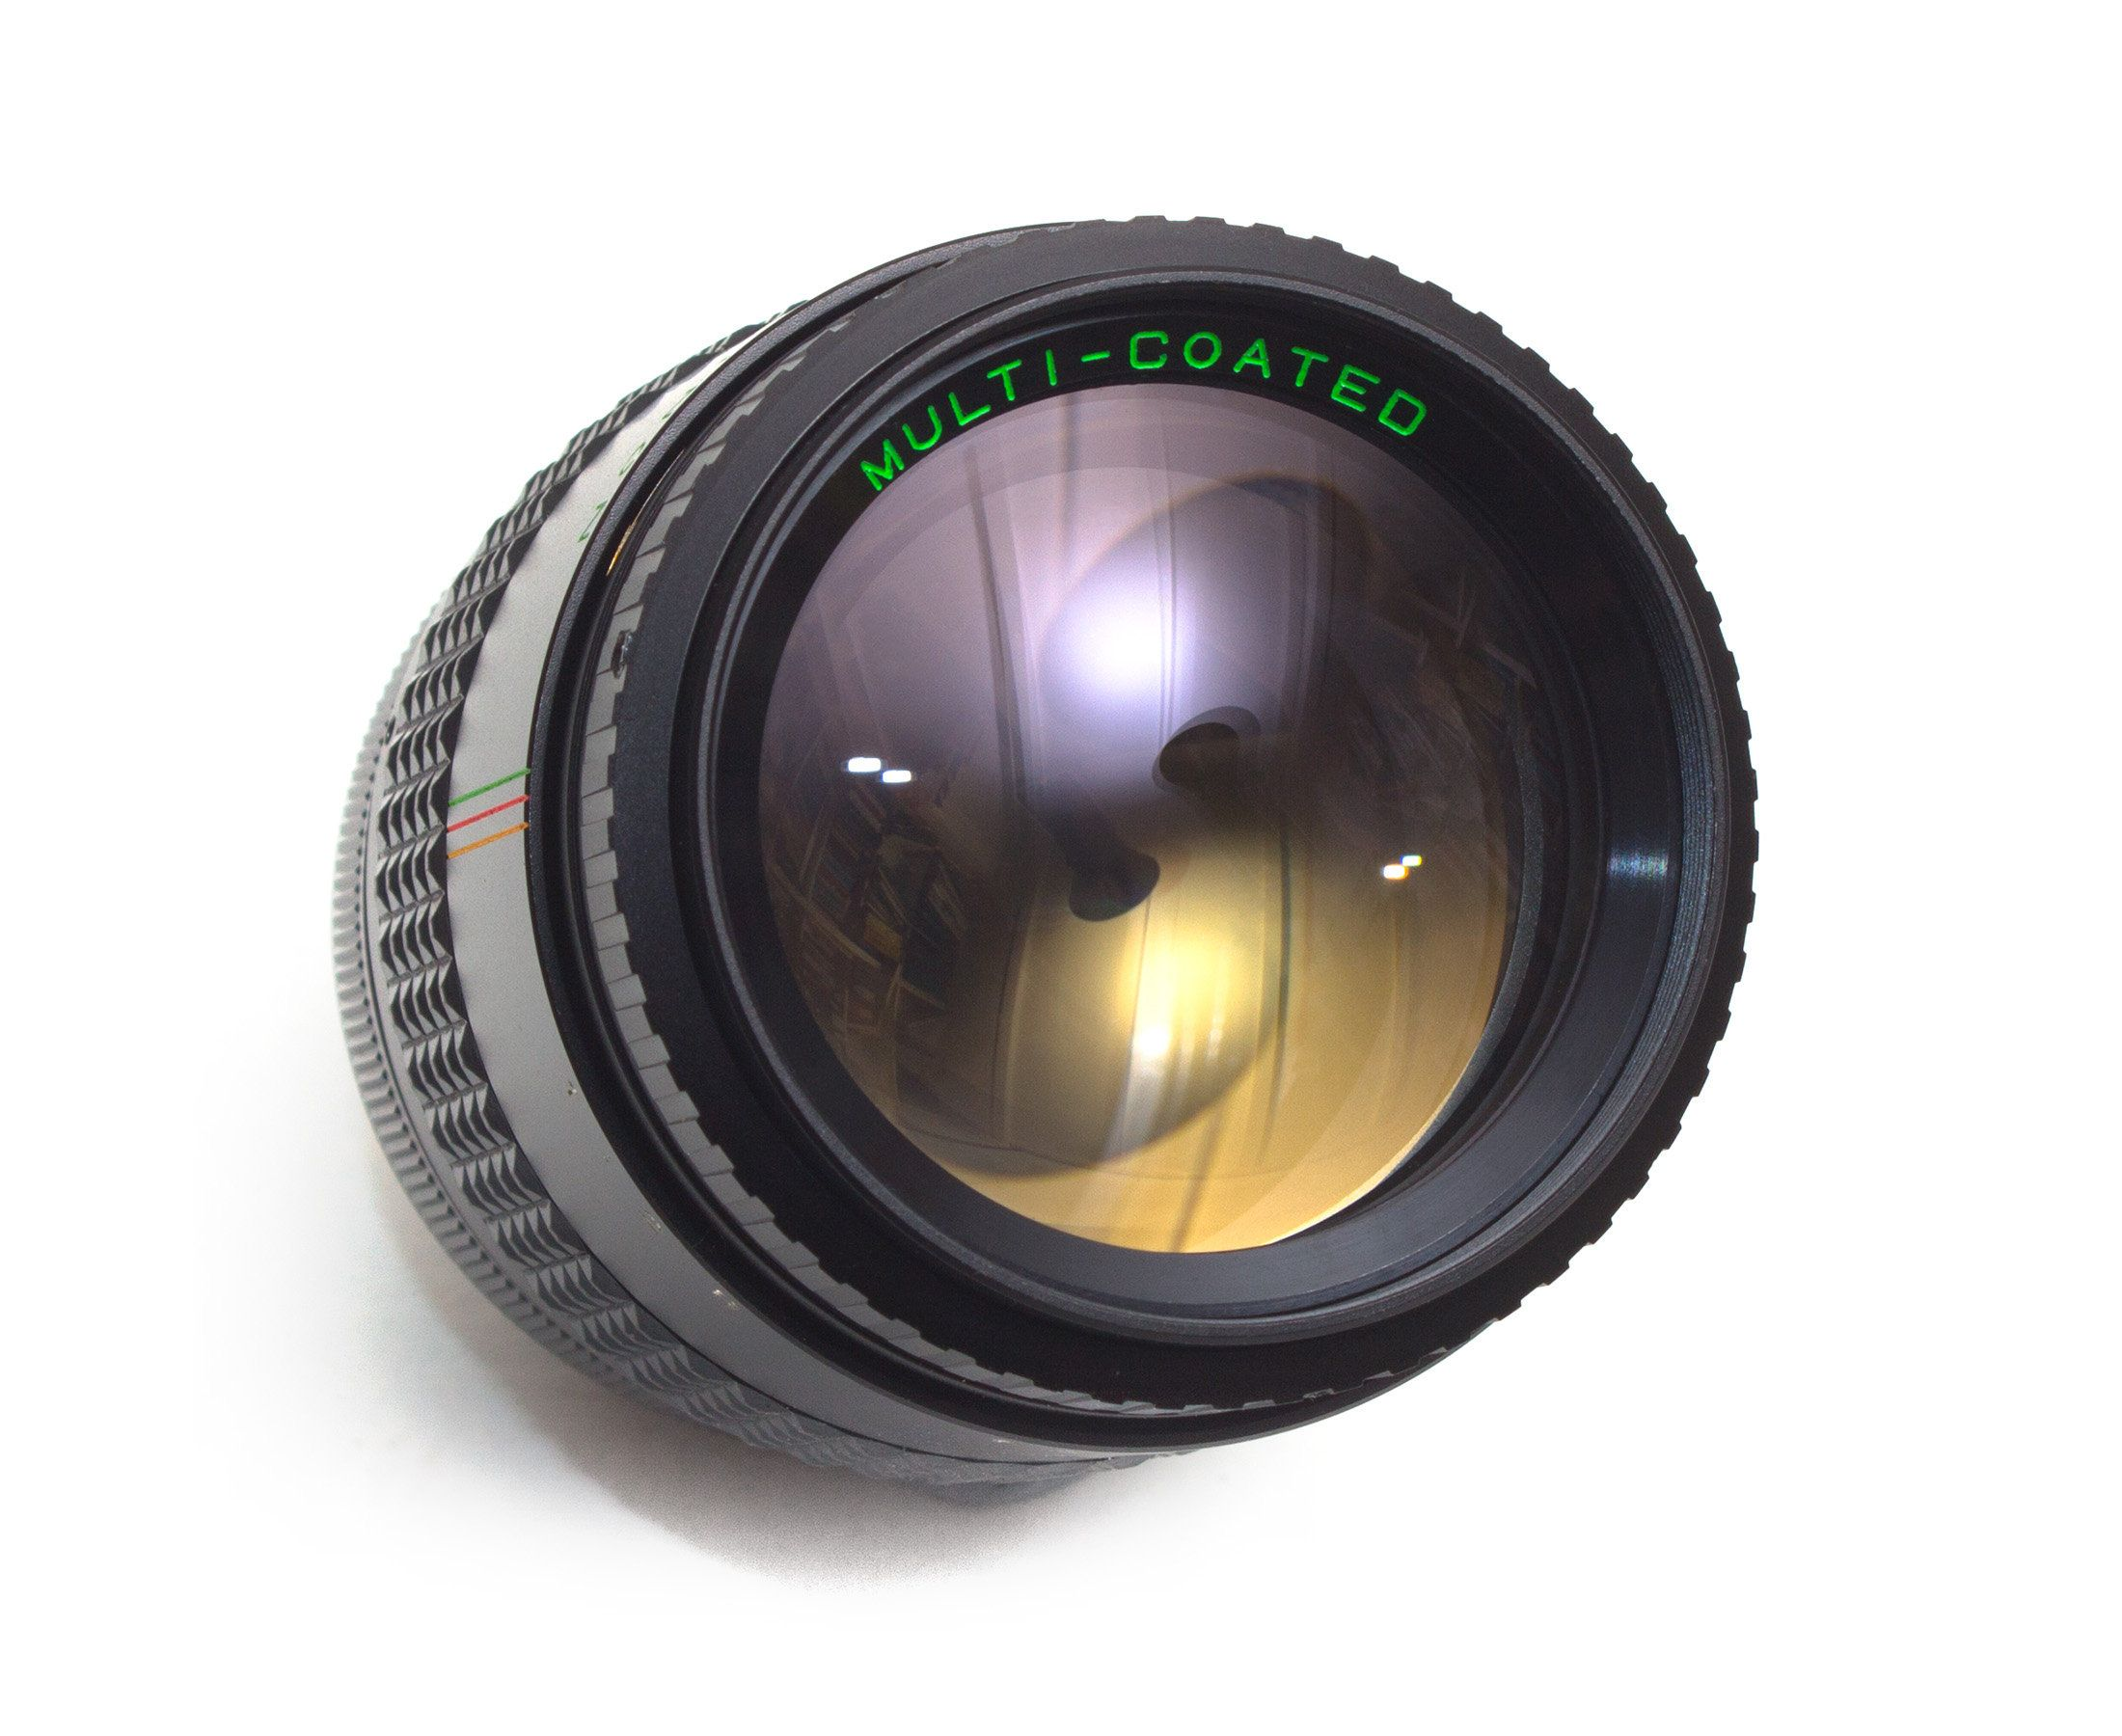 Makinon 135mm F2 8 Telephoto Portrait Prime Lens Macro Pentax K Pk Fit Dslr Adaptable Mft Bmcc By 7cameras On Etsy Vintage Lenses Cameras For Sale Prime Lens